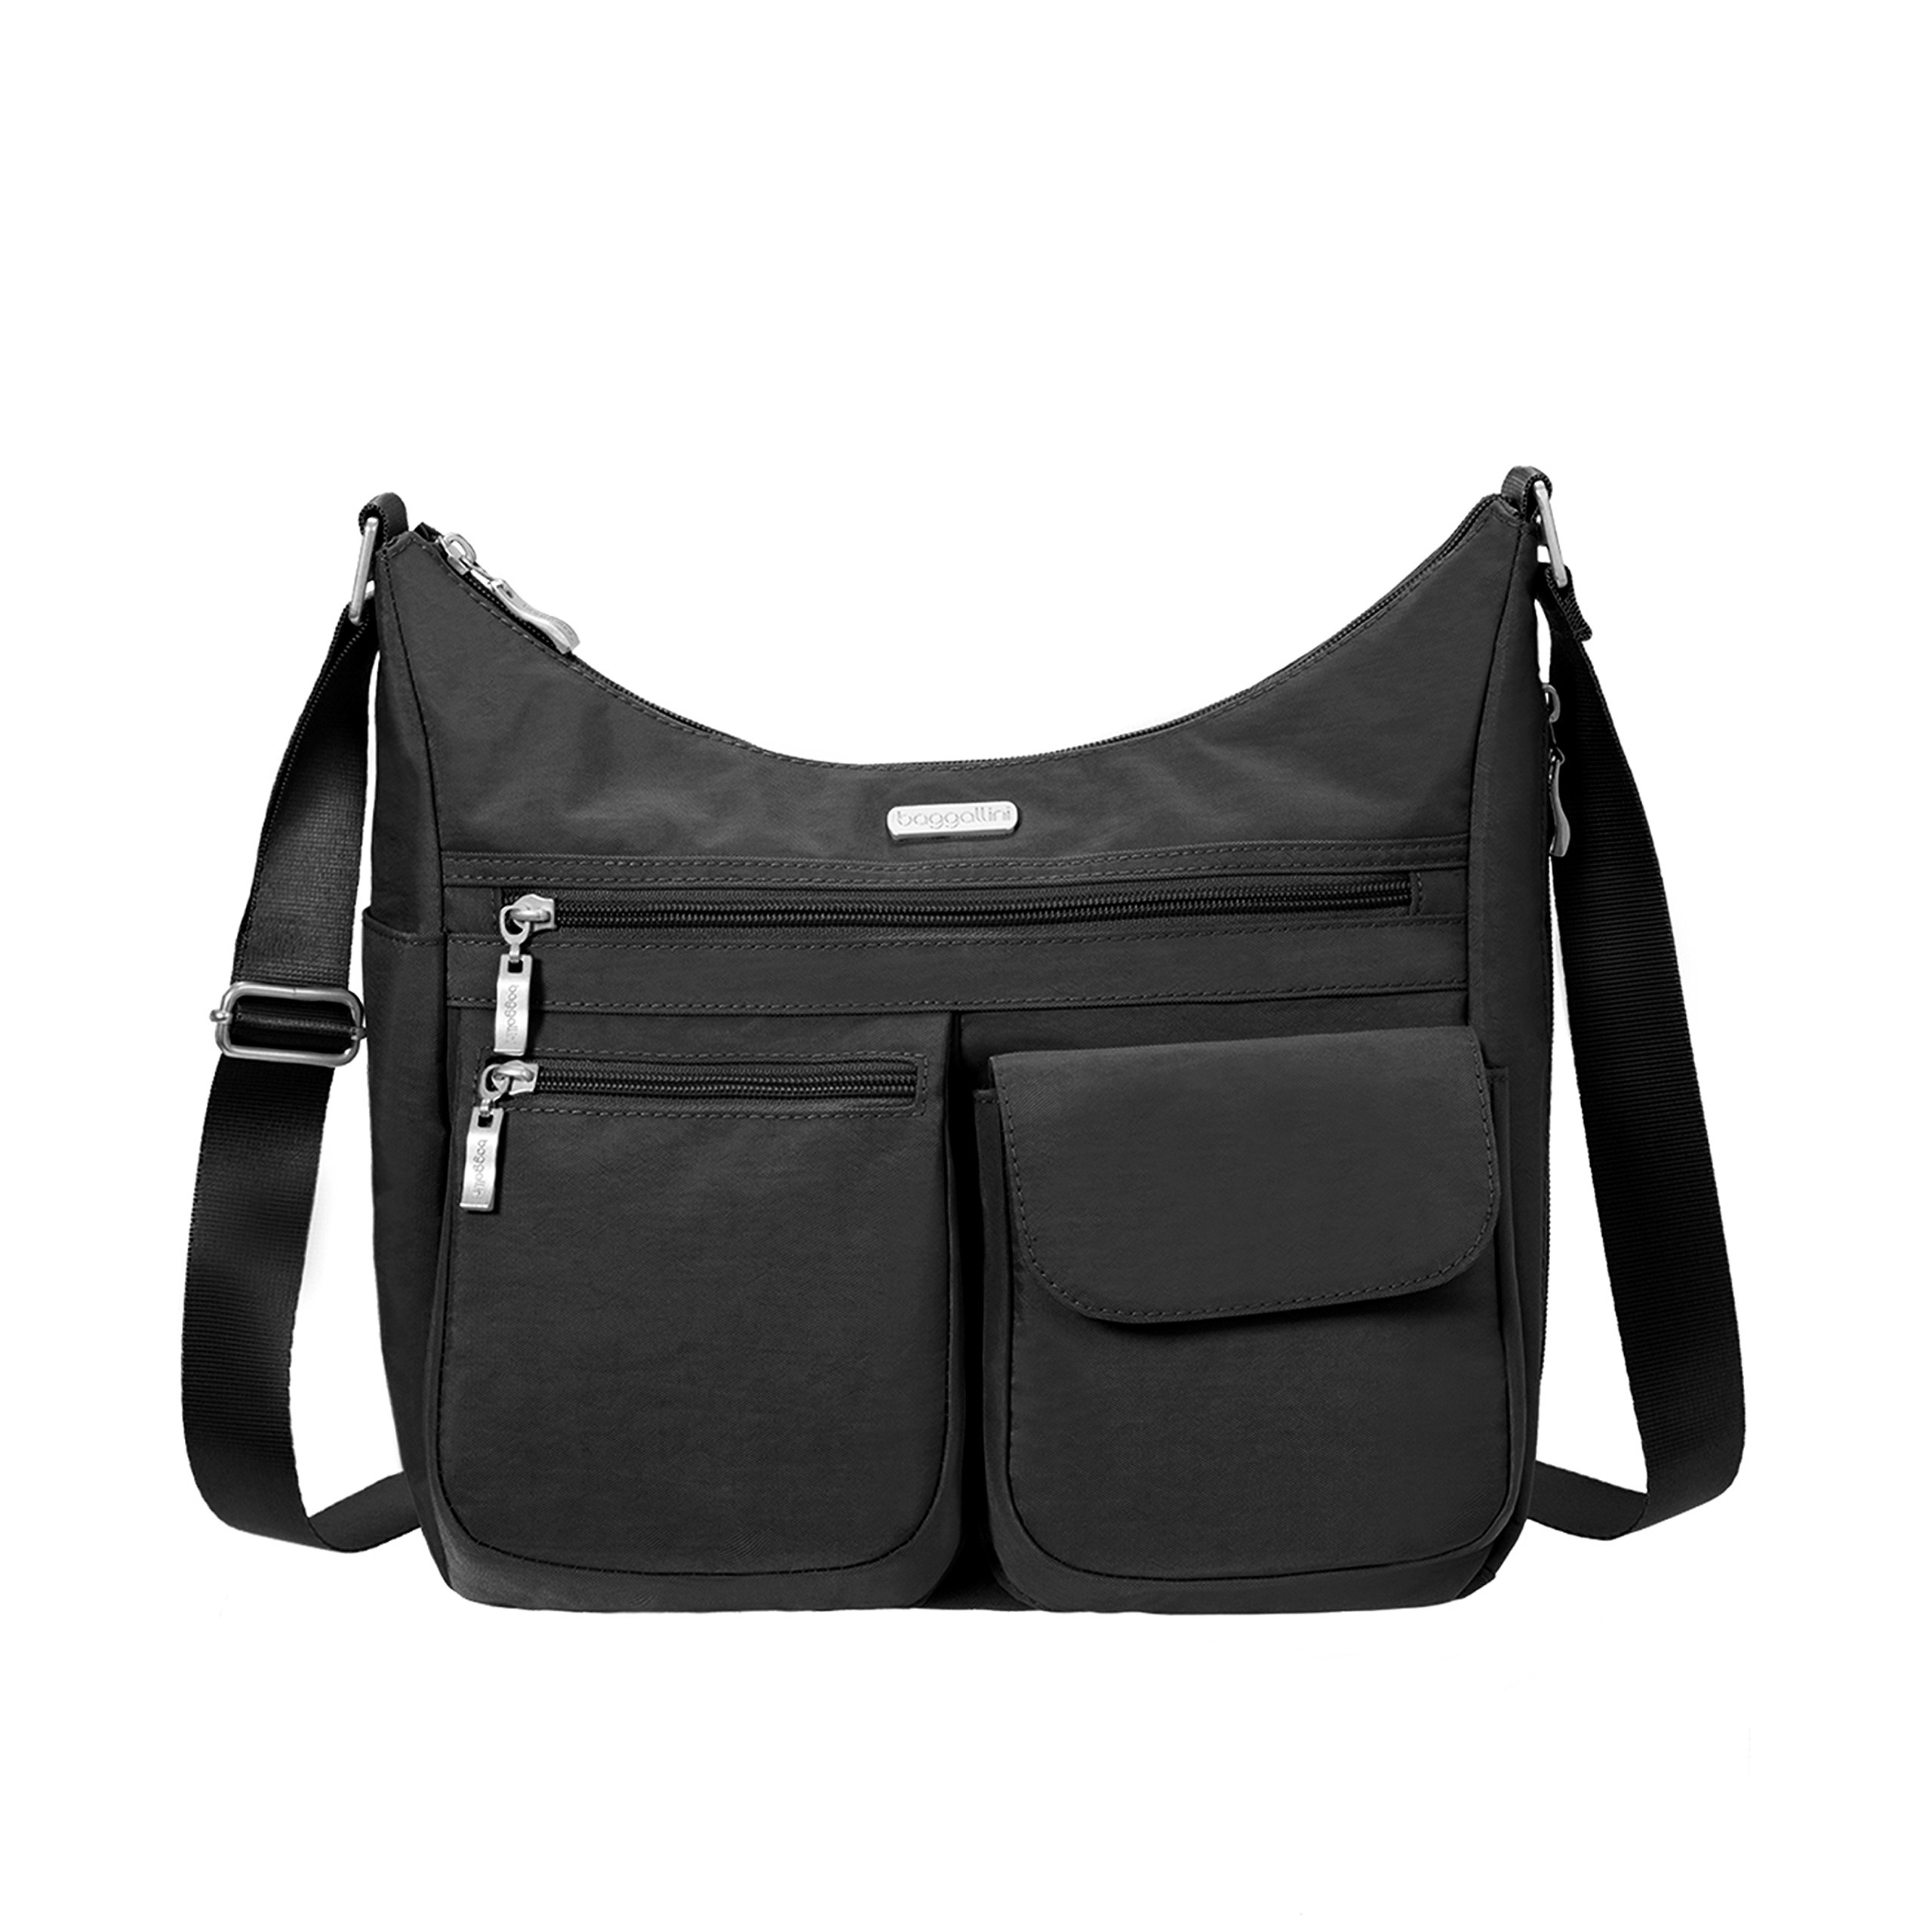 Baggallini Crossbody Bag for Women - Functional, Lightweight, Key Foab & Wristle (moss)